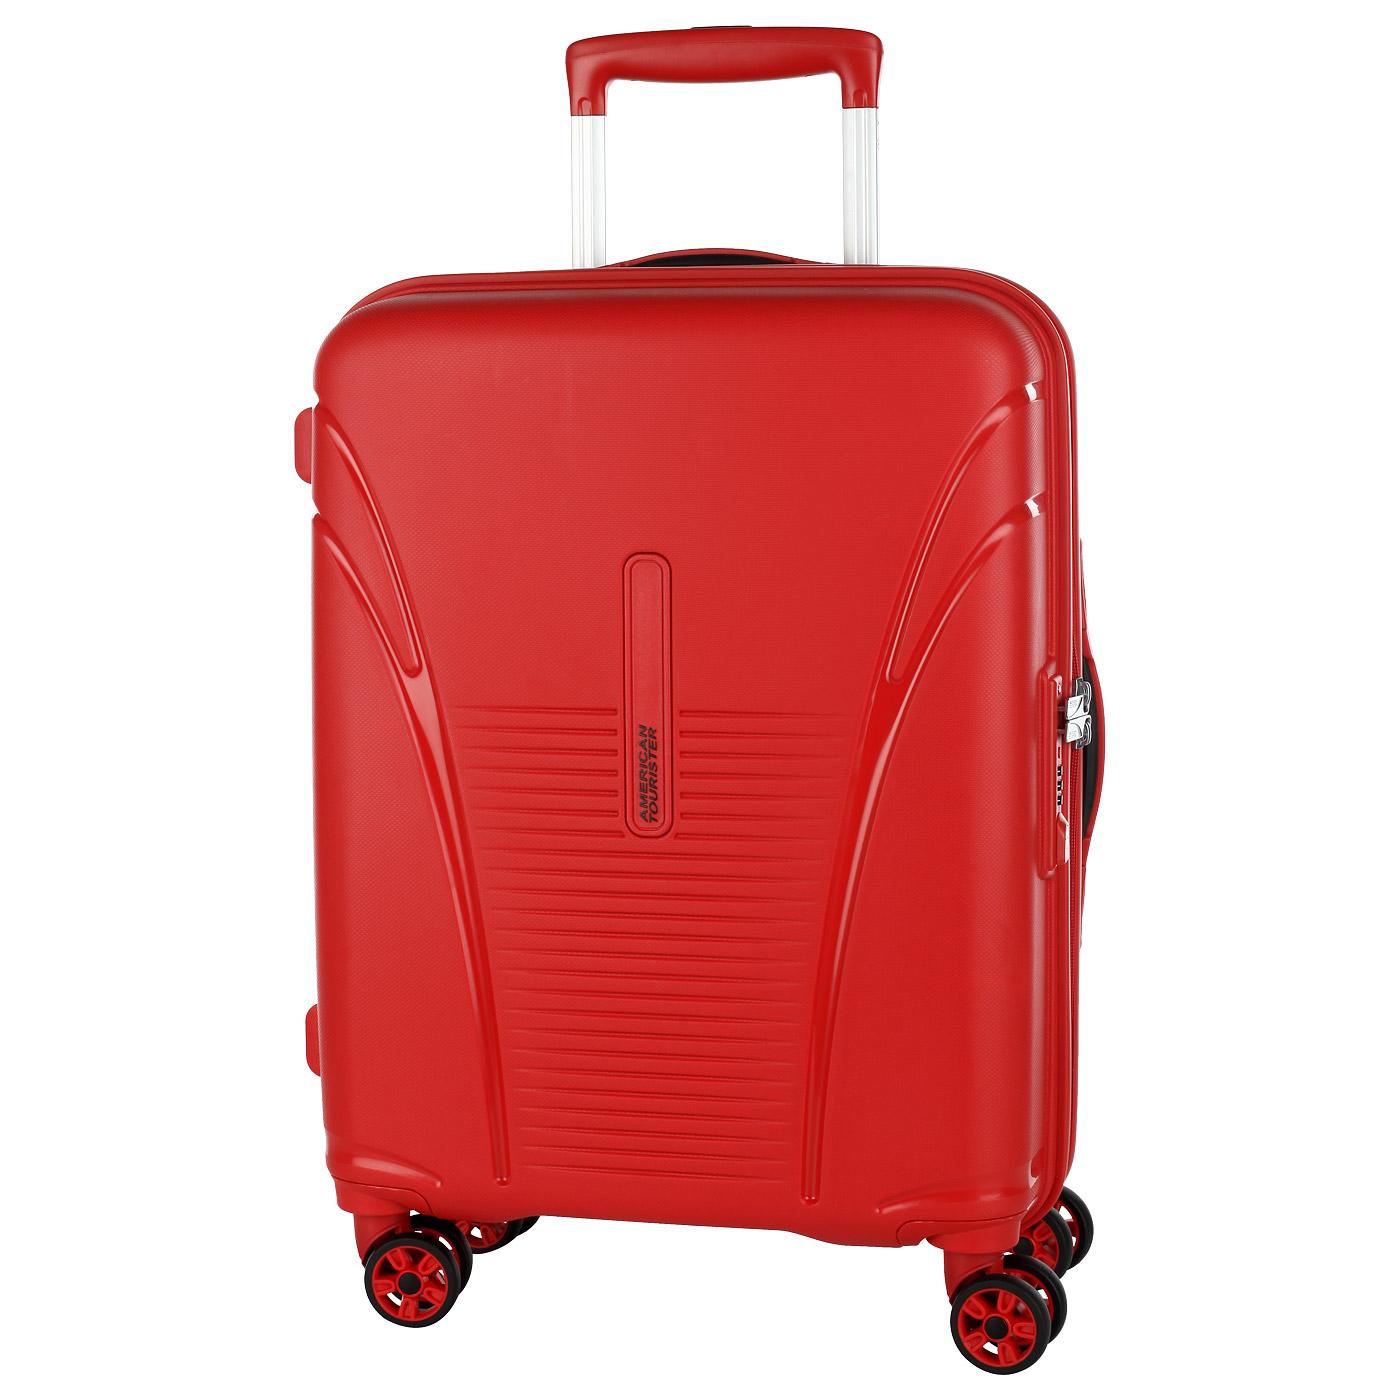 10e774f4859c Маленький чемодан на колесах American Tourister Skytracer 22G00001 ...